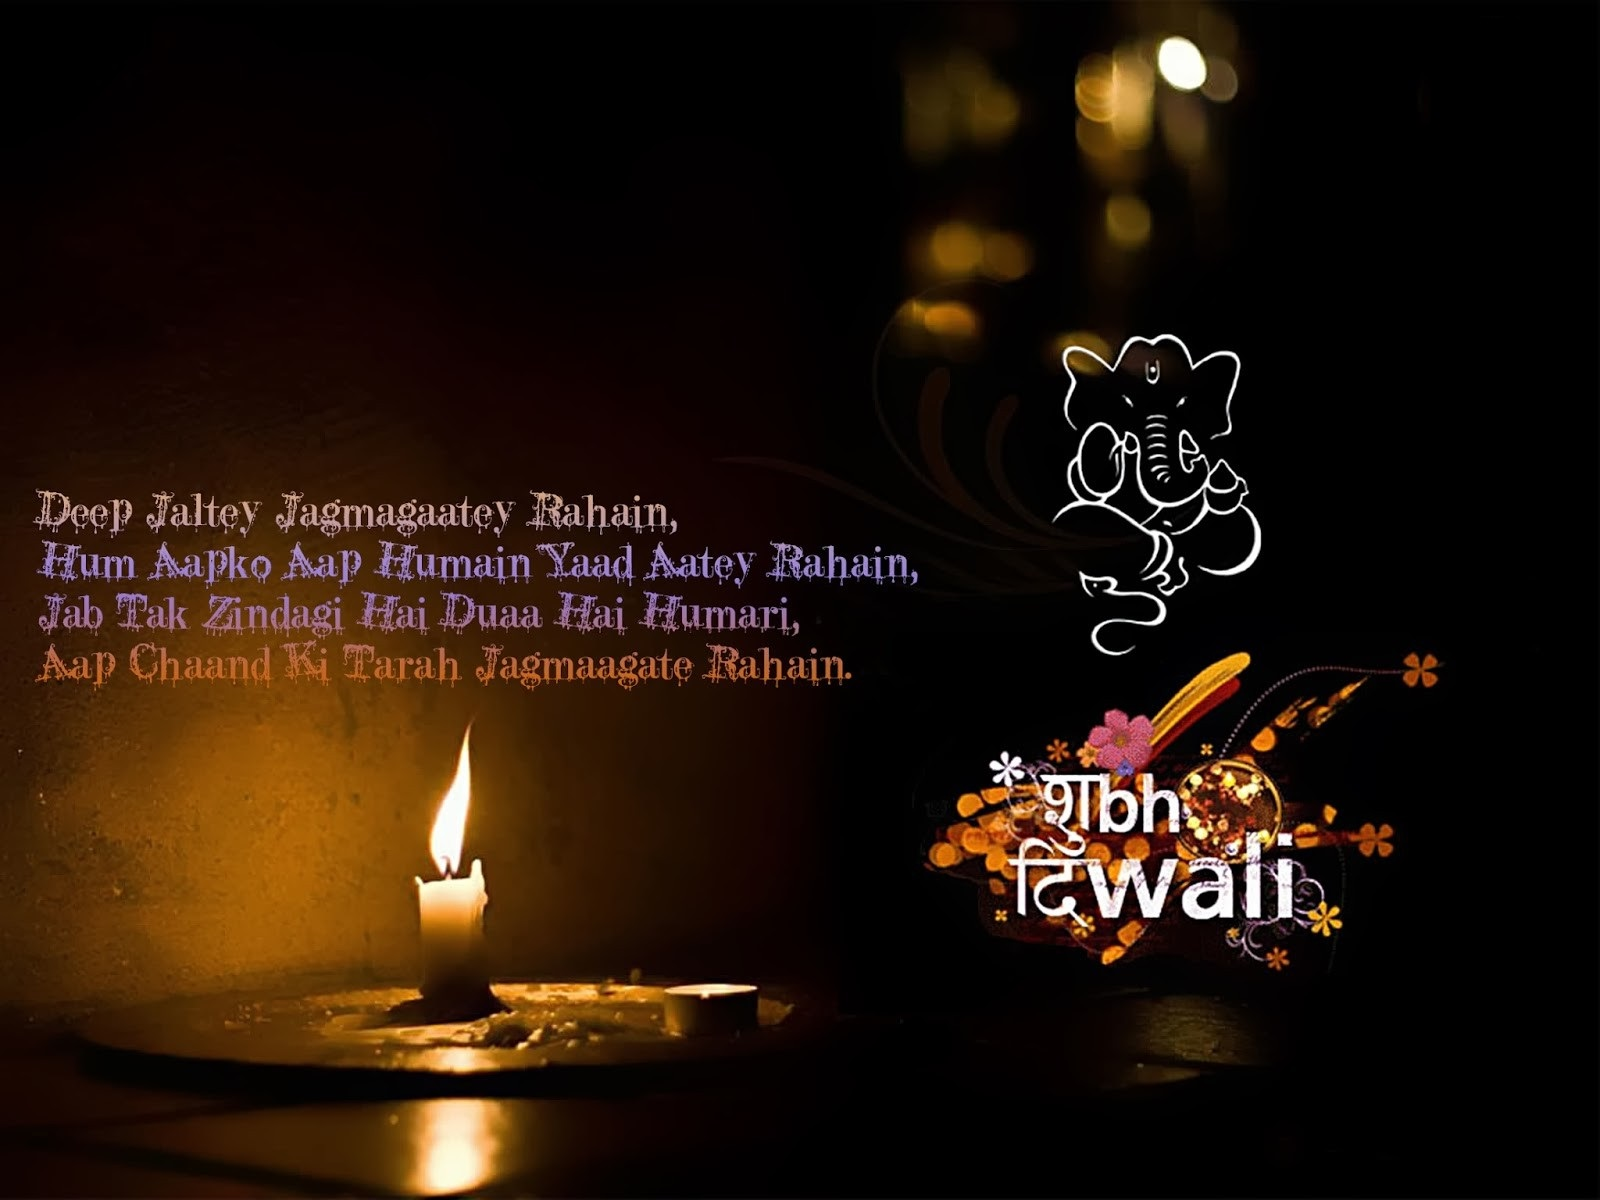 Shubh {Deepavali} Diwali Short Line